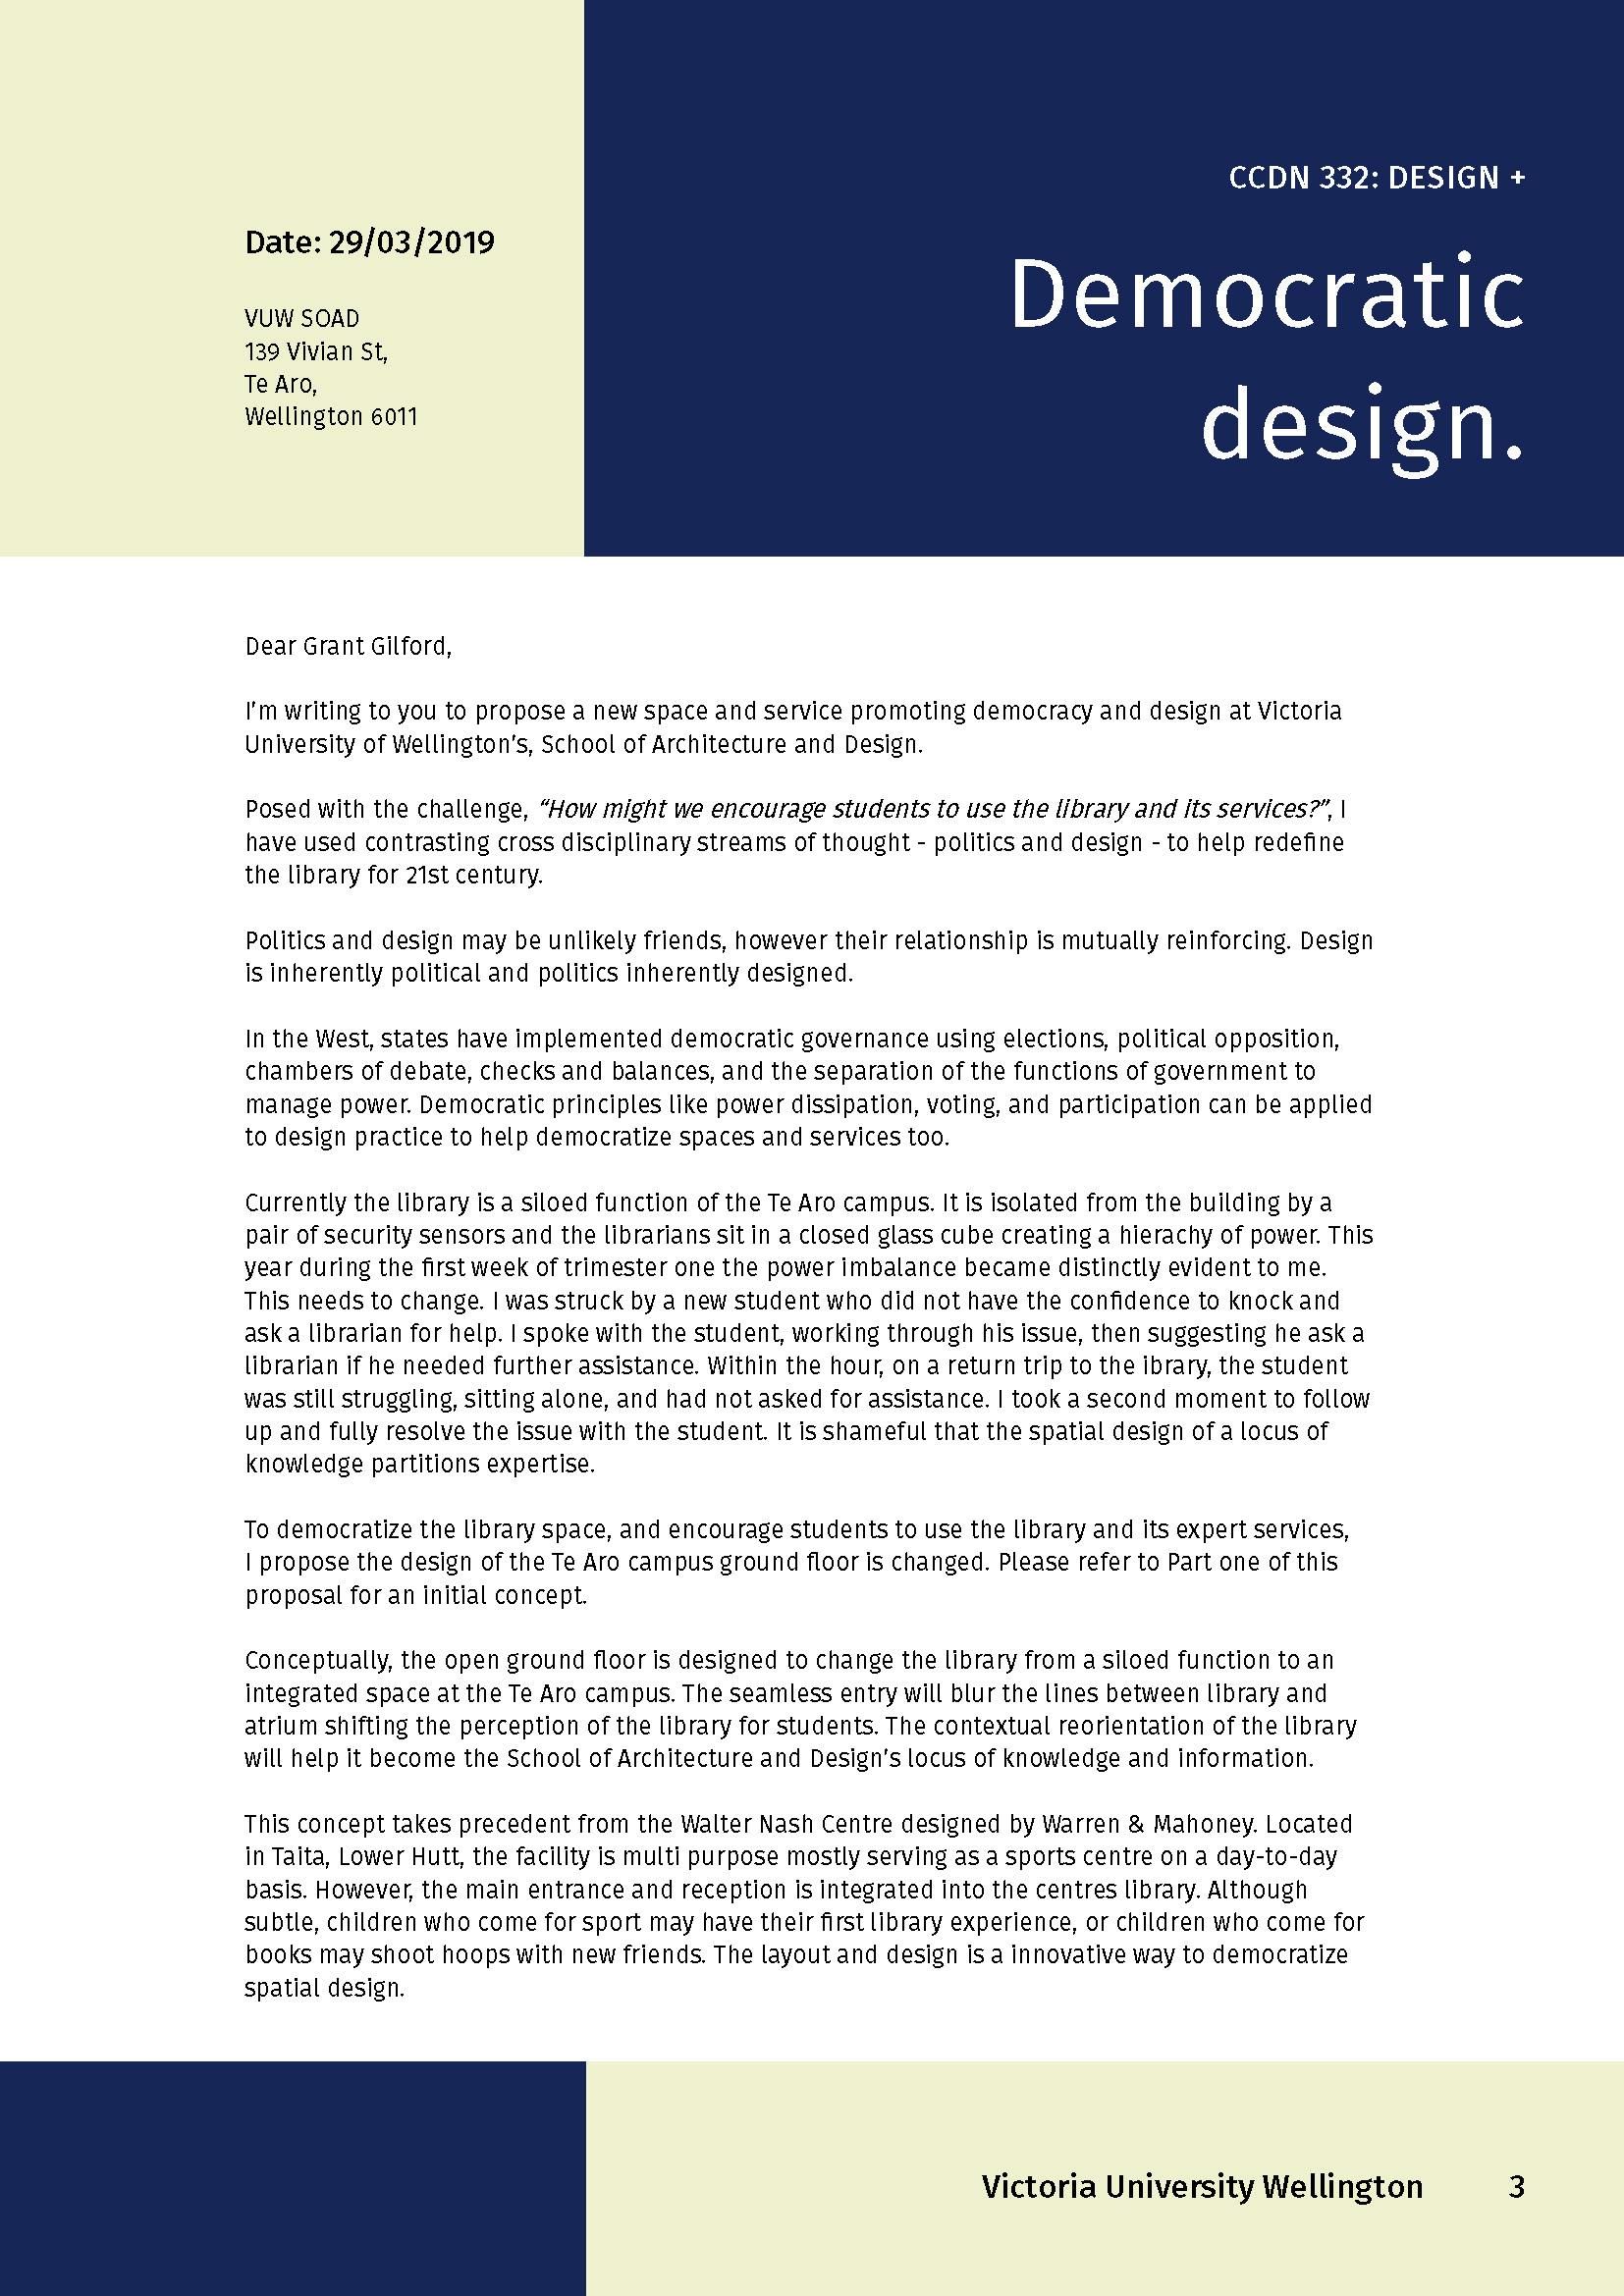 Samuel Bryan CCDN332 Project One Page 03.jpg